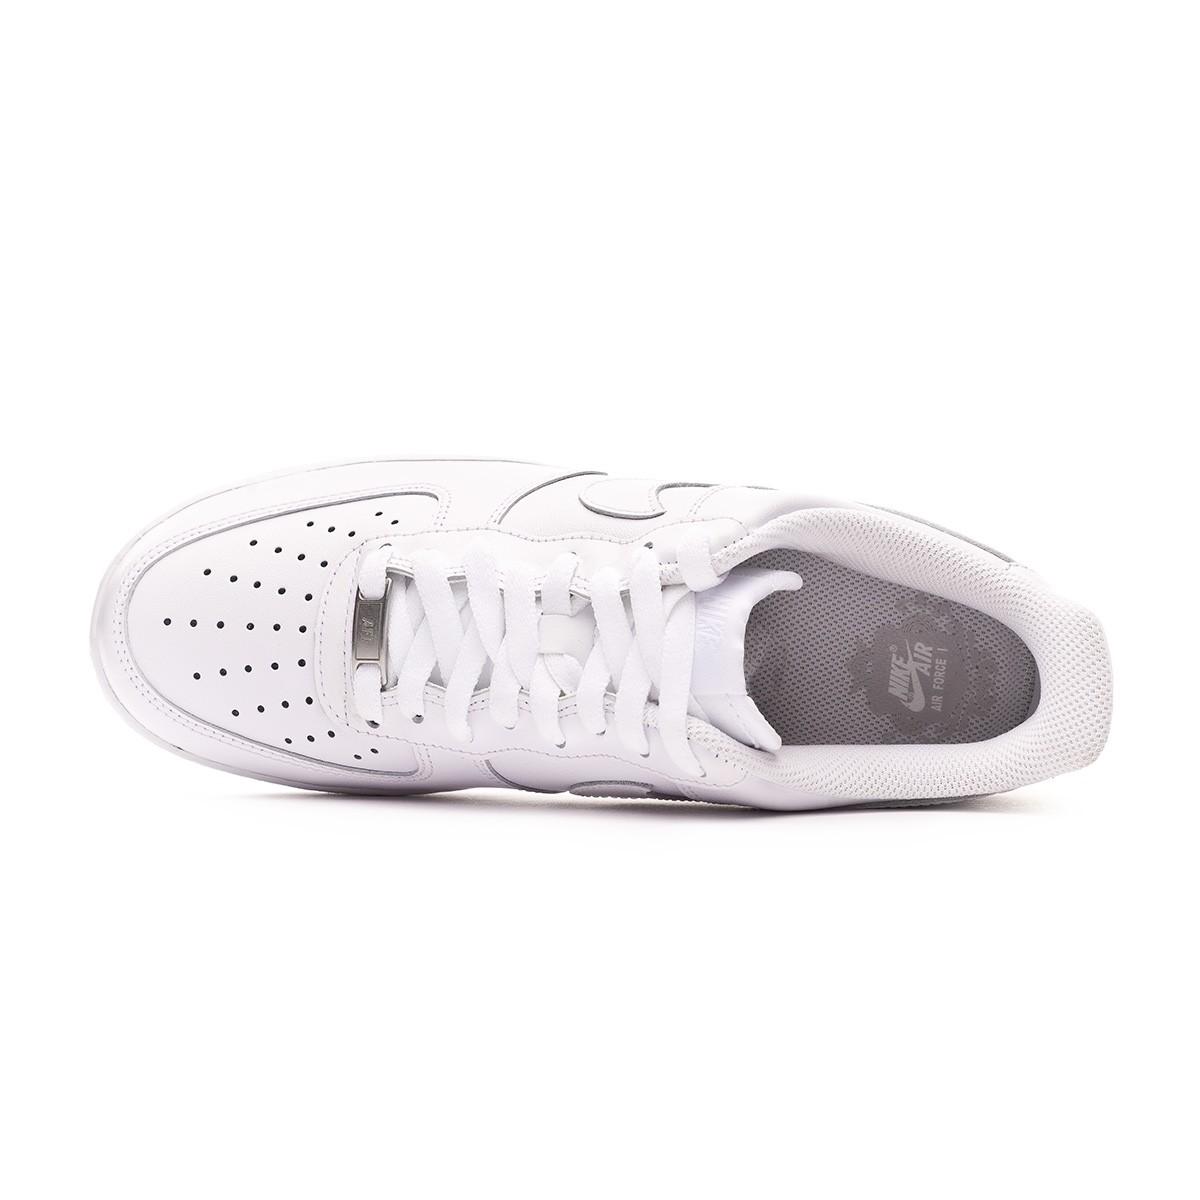 Baskets Nike Air Force 1 '07 White Boutique de football